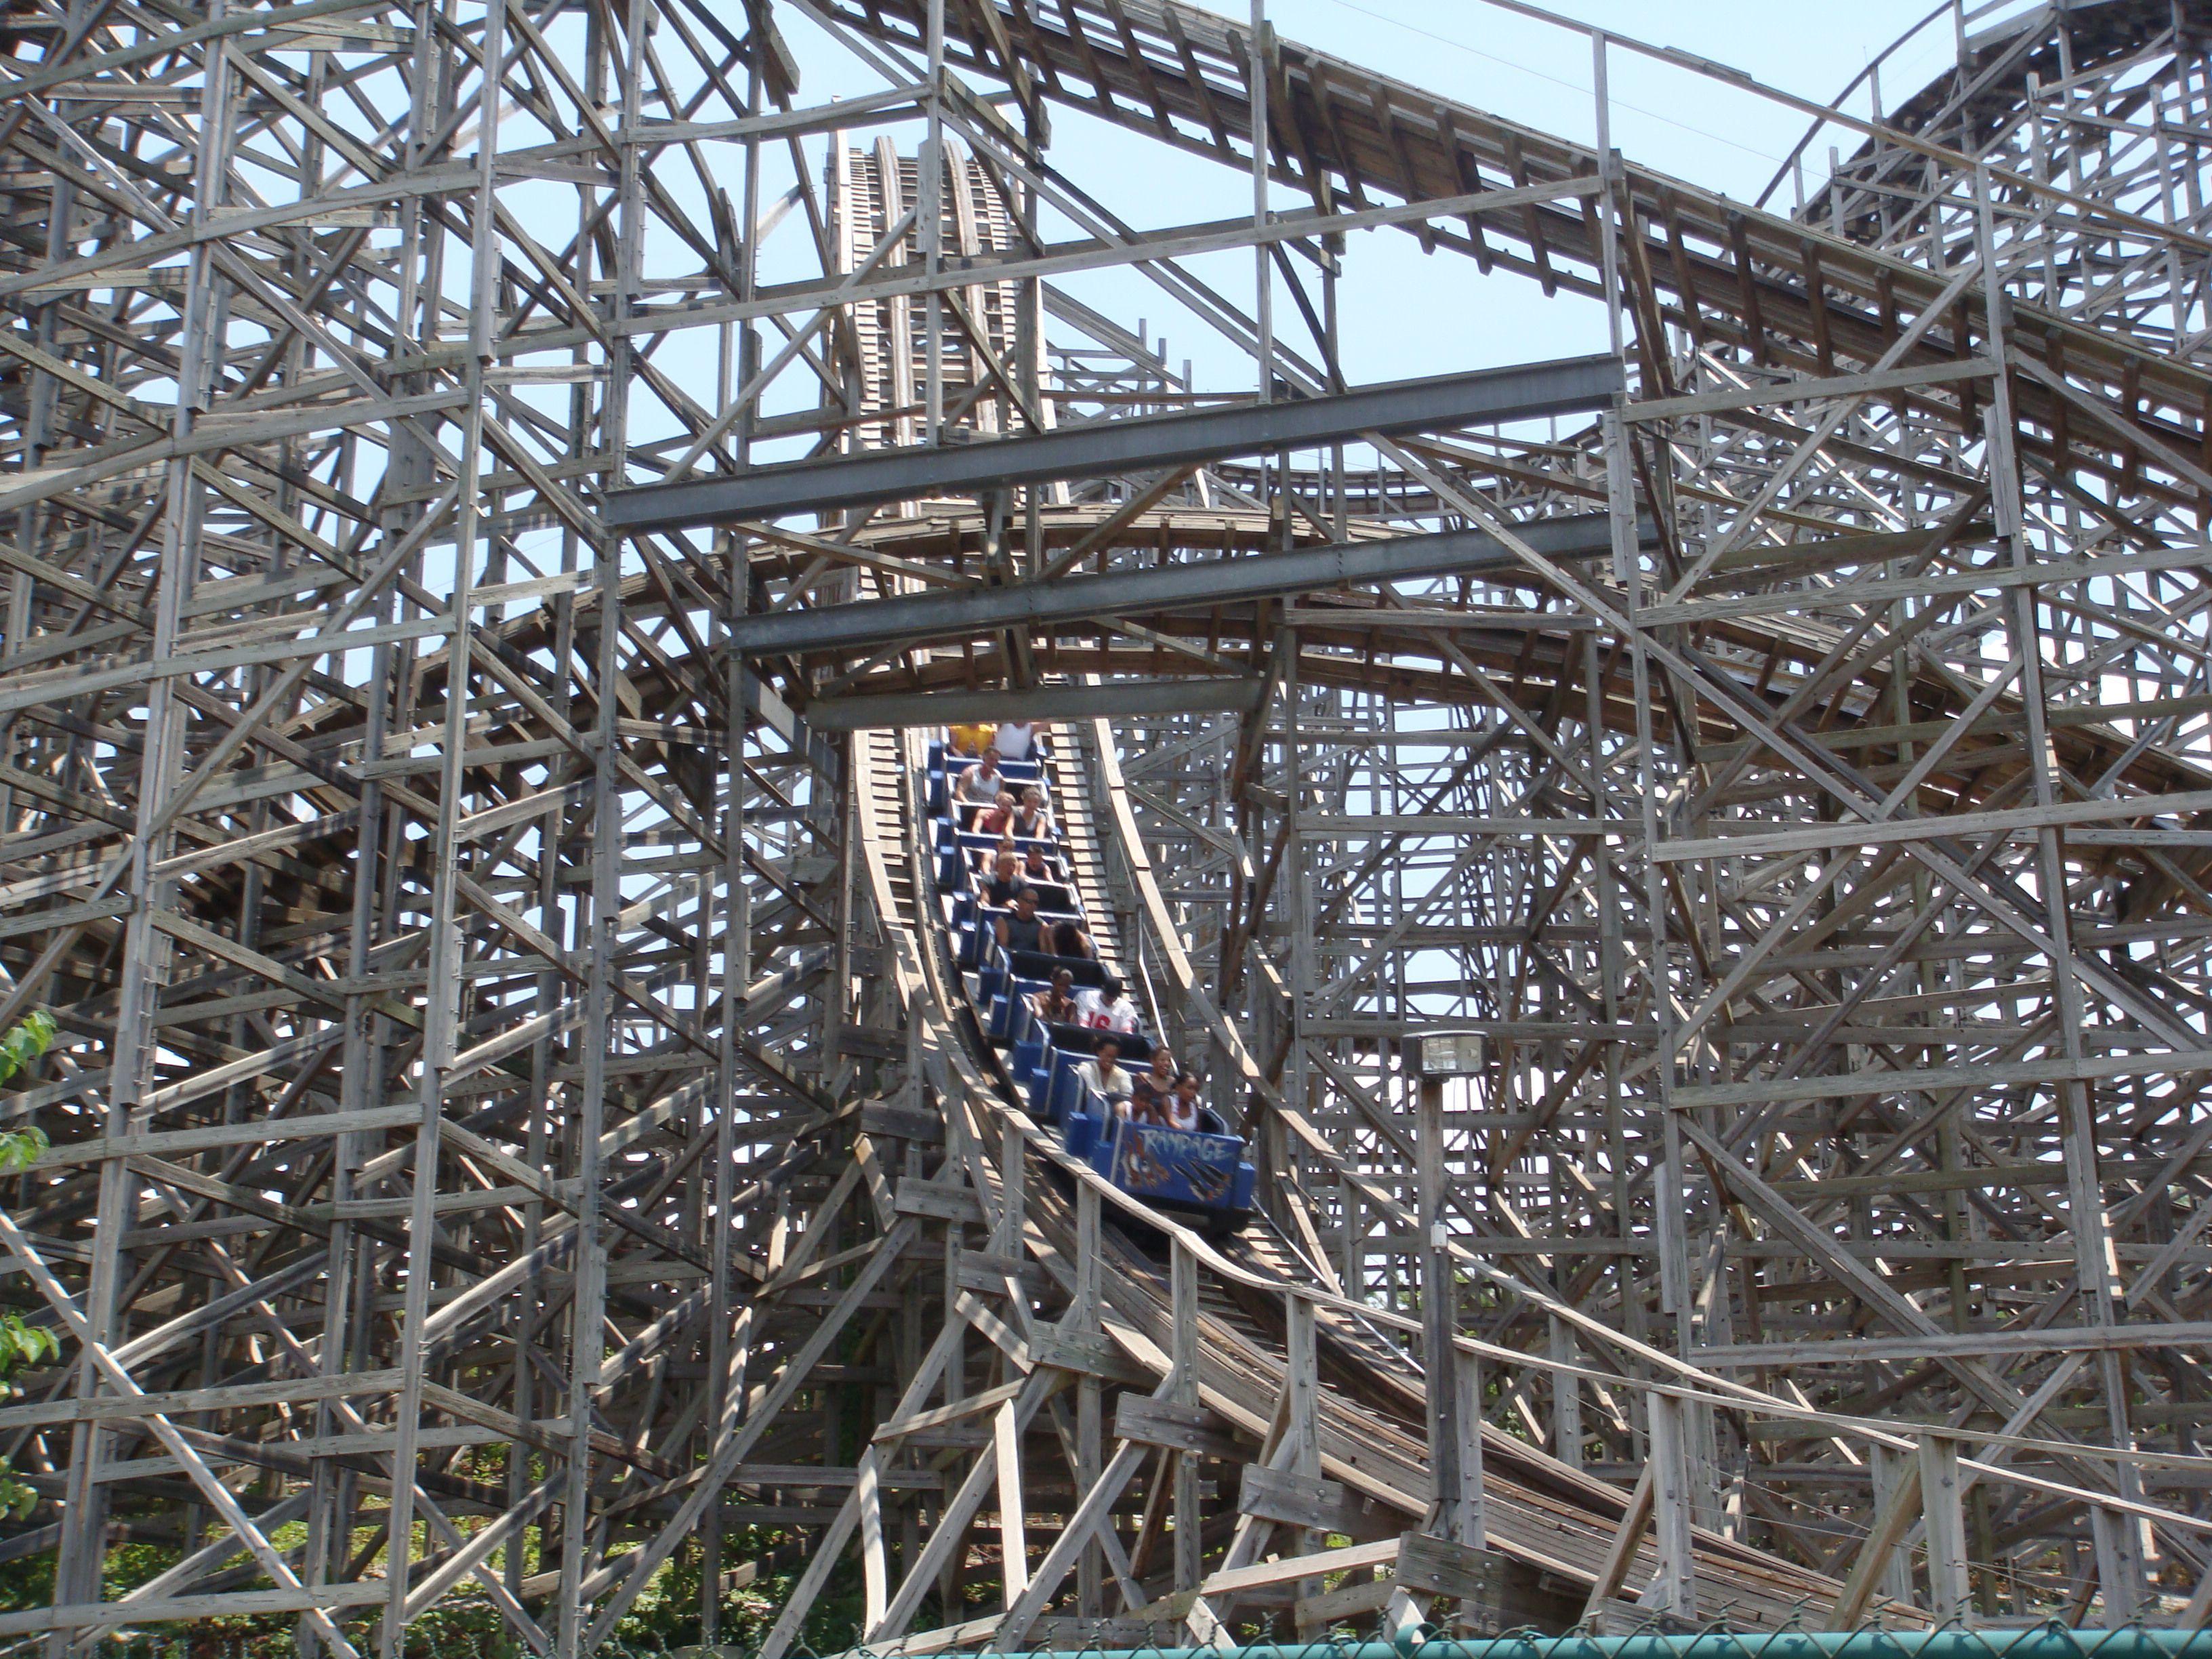 The Rampage roller coaster at Alabama Adventure